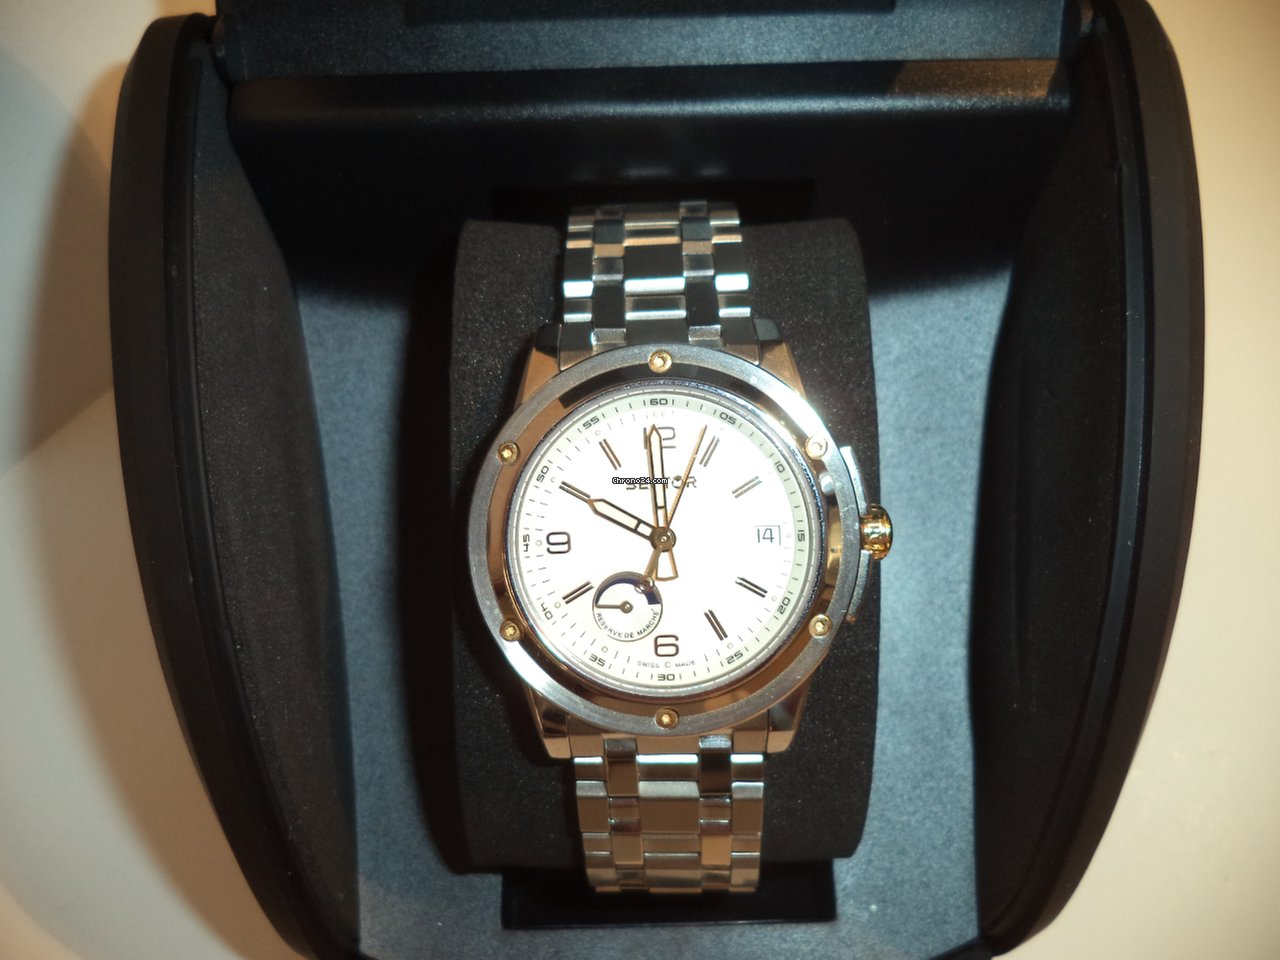 a3551c335a0 Comprar relógios Sector